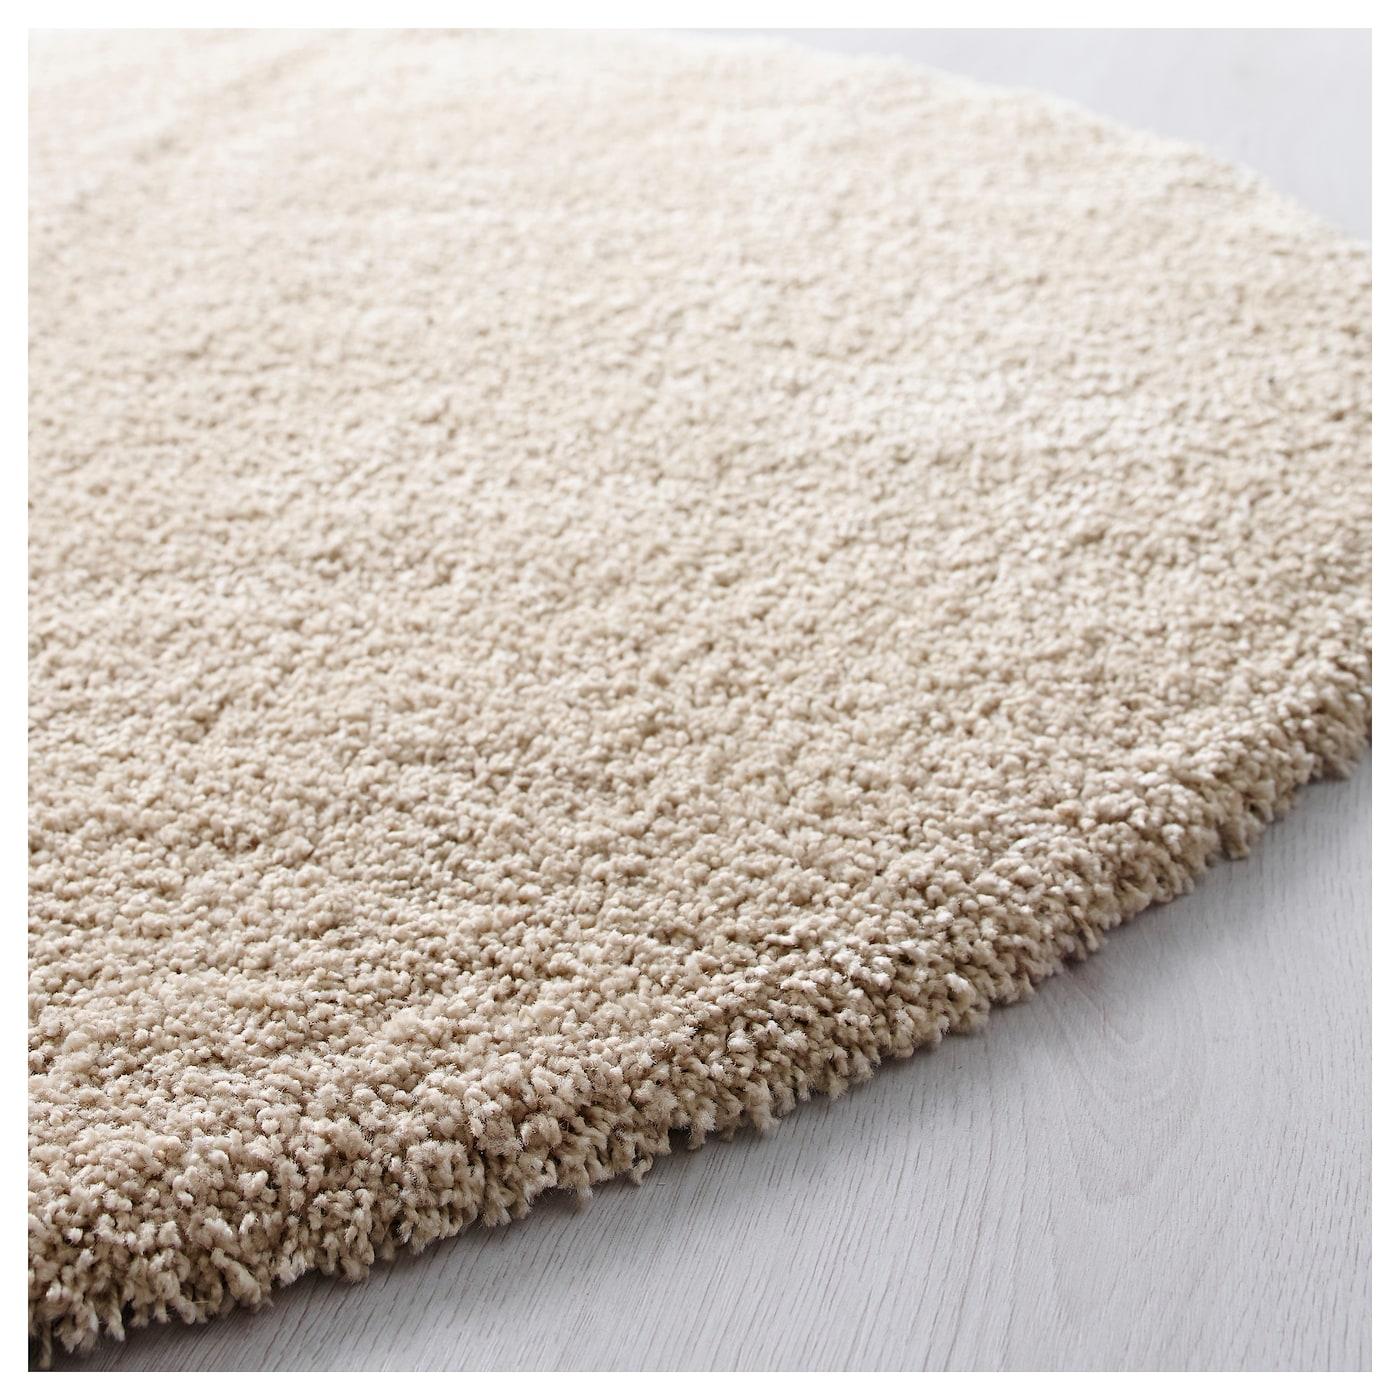 dum tapis poils hauts blanc cass 195 cm ikea. Black Bedroom Furniture Sets. Home Design Ideas